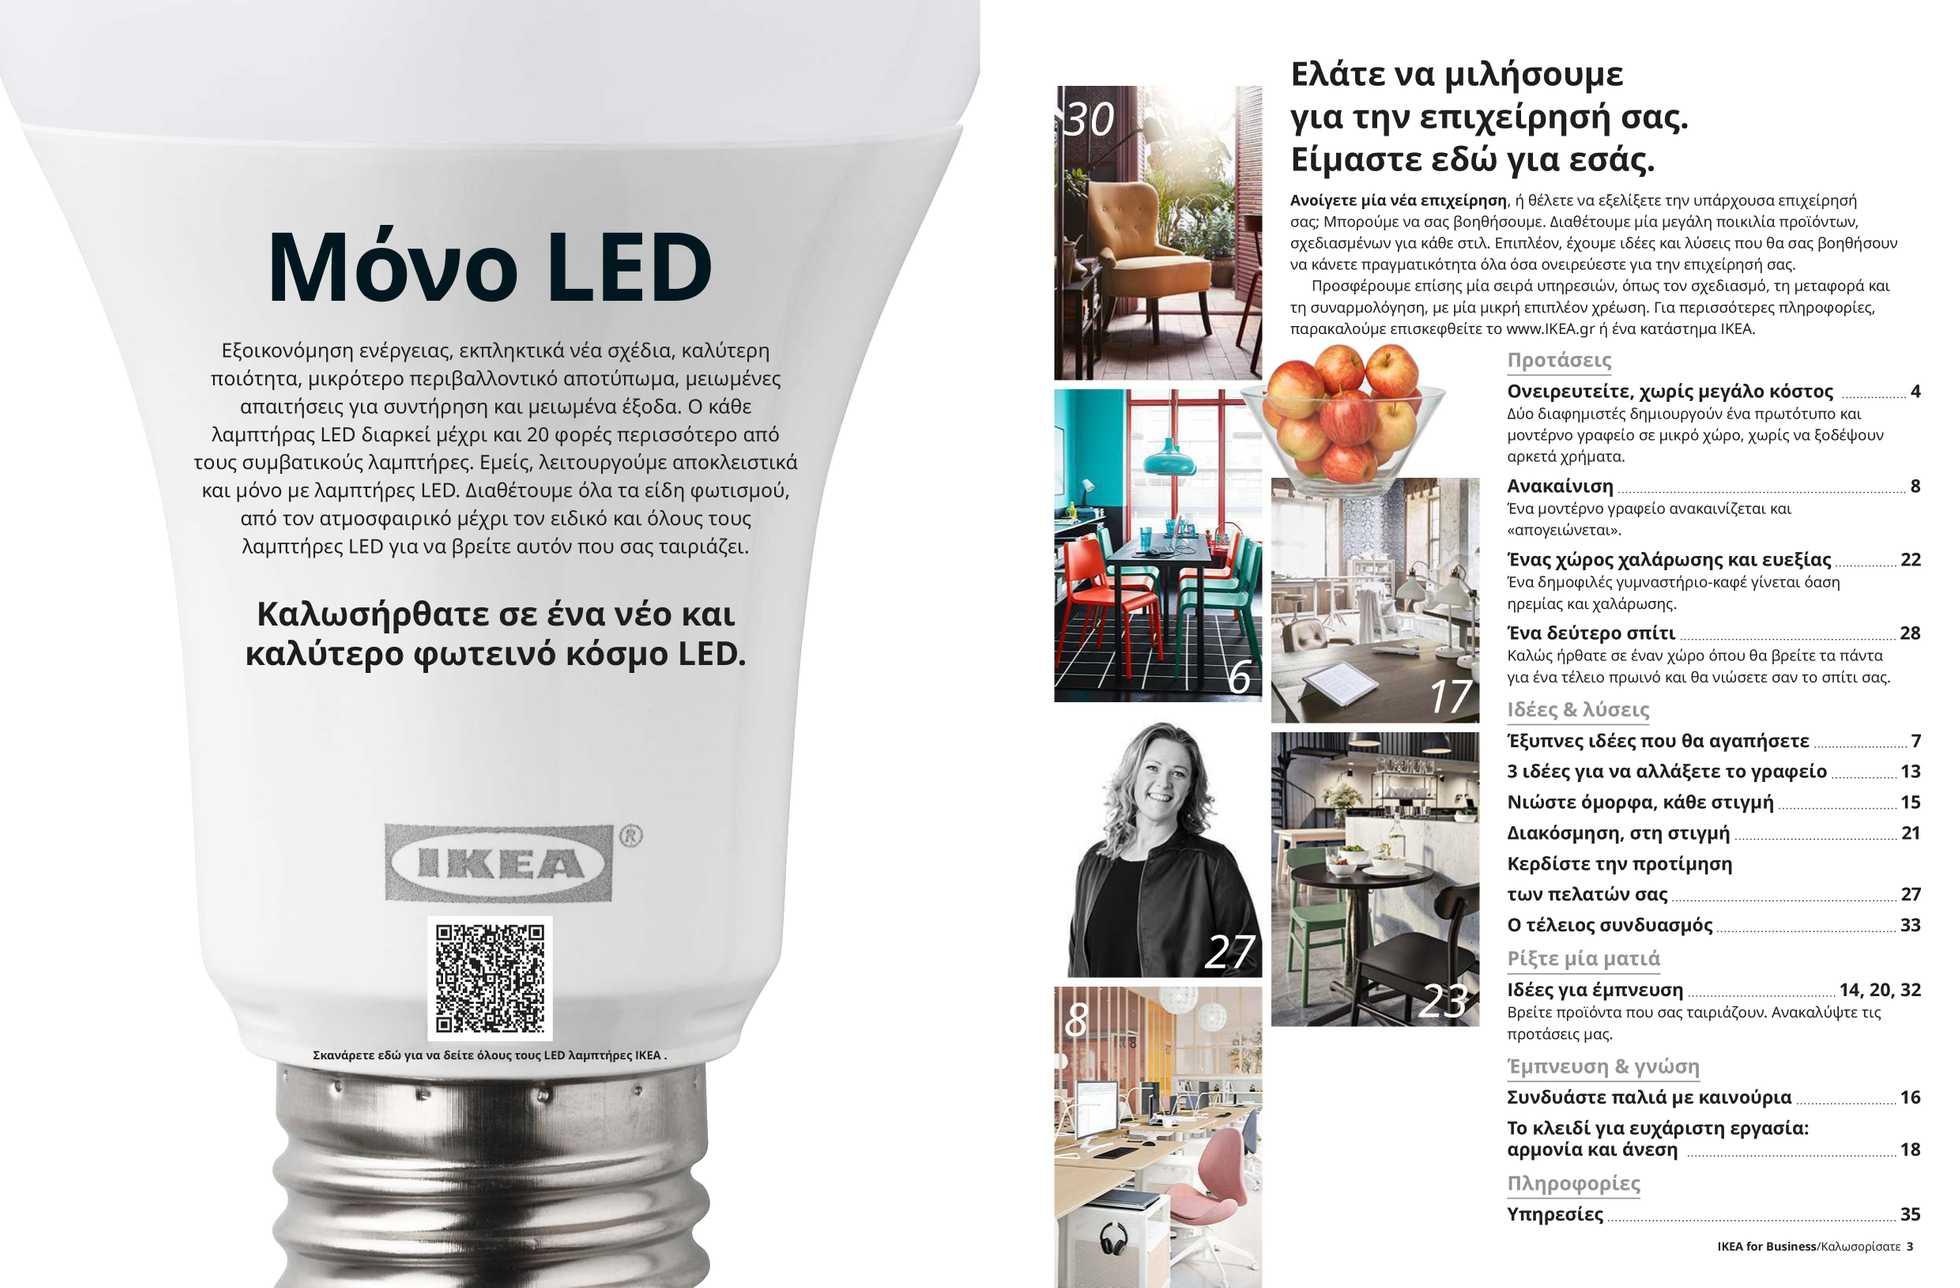 IKEA - η προσφορά ισχύει από 01.01.2020 μέχρι 15.08.2020 - σελίδα 2.